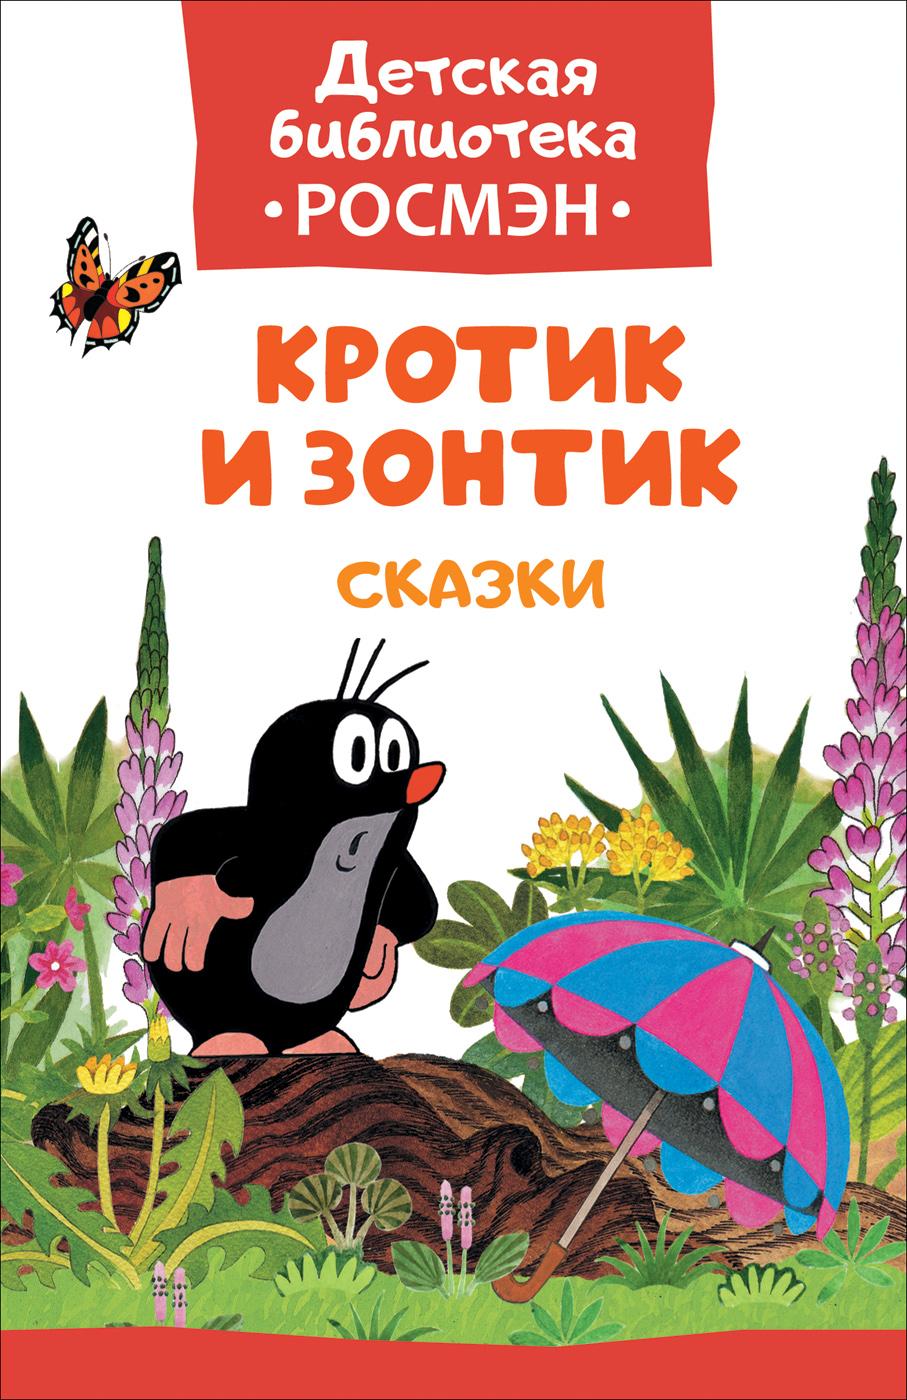 милер з кротик и штанишки сказки Милер З. Кротик и зонтик (ДБ РОСМЭН)